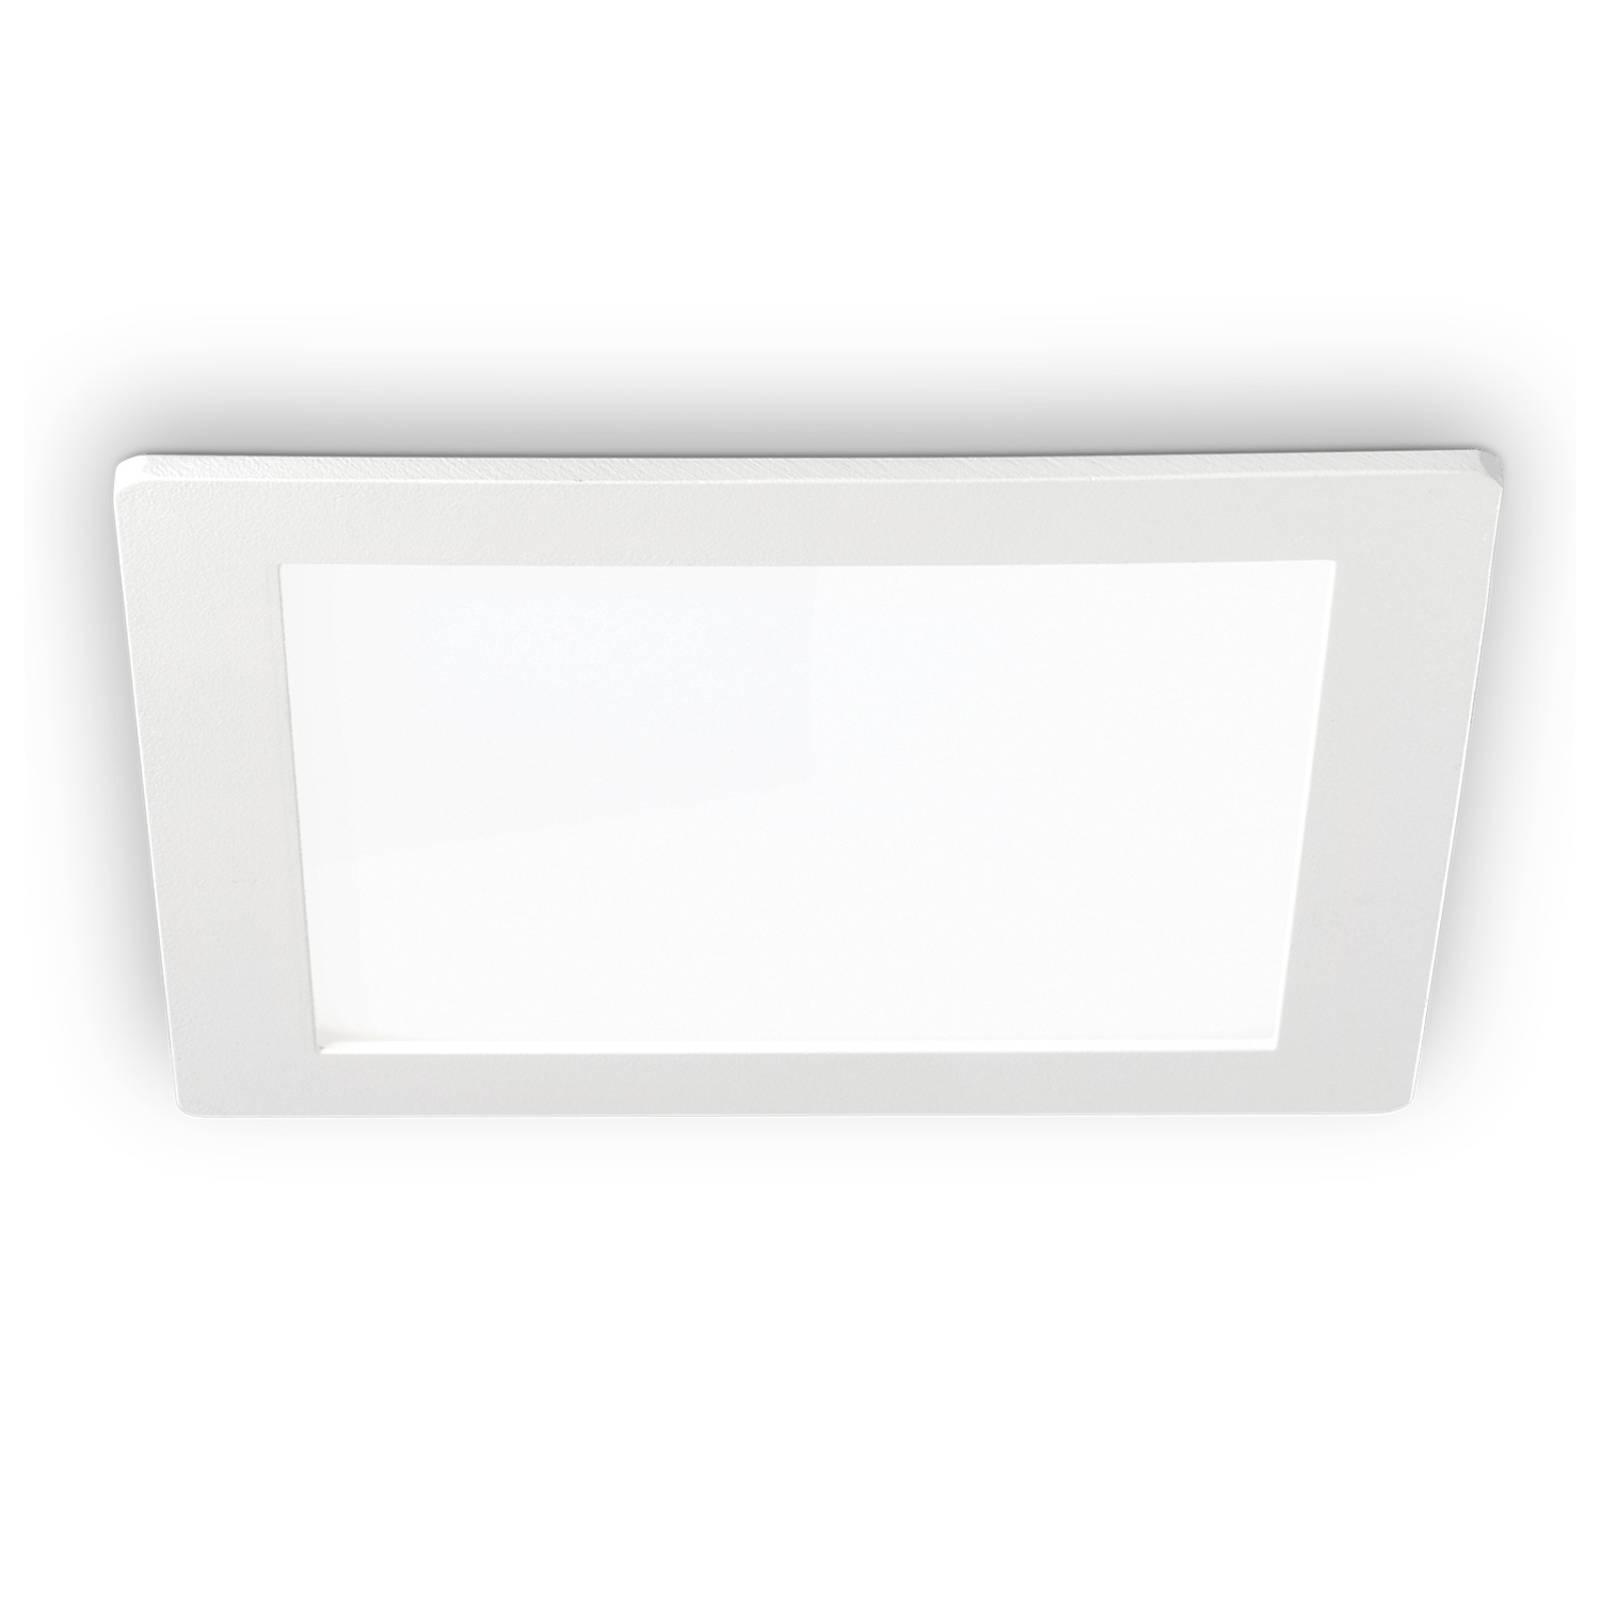 LED-kattouppovalaisin Groove square 22,7 x 22,7 cm